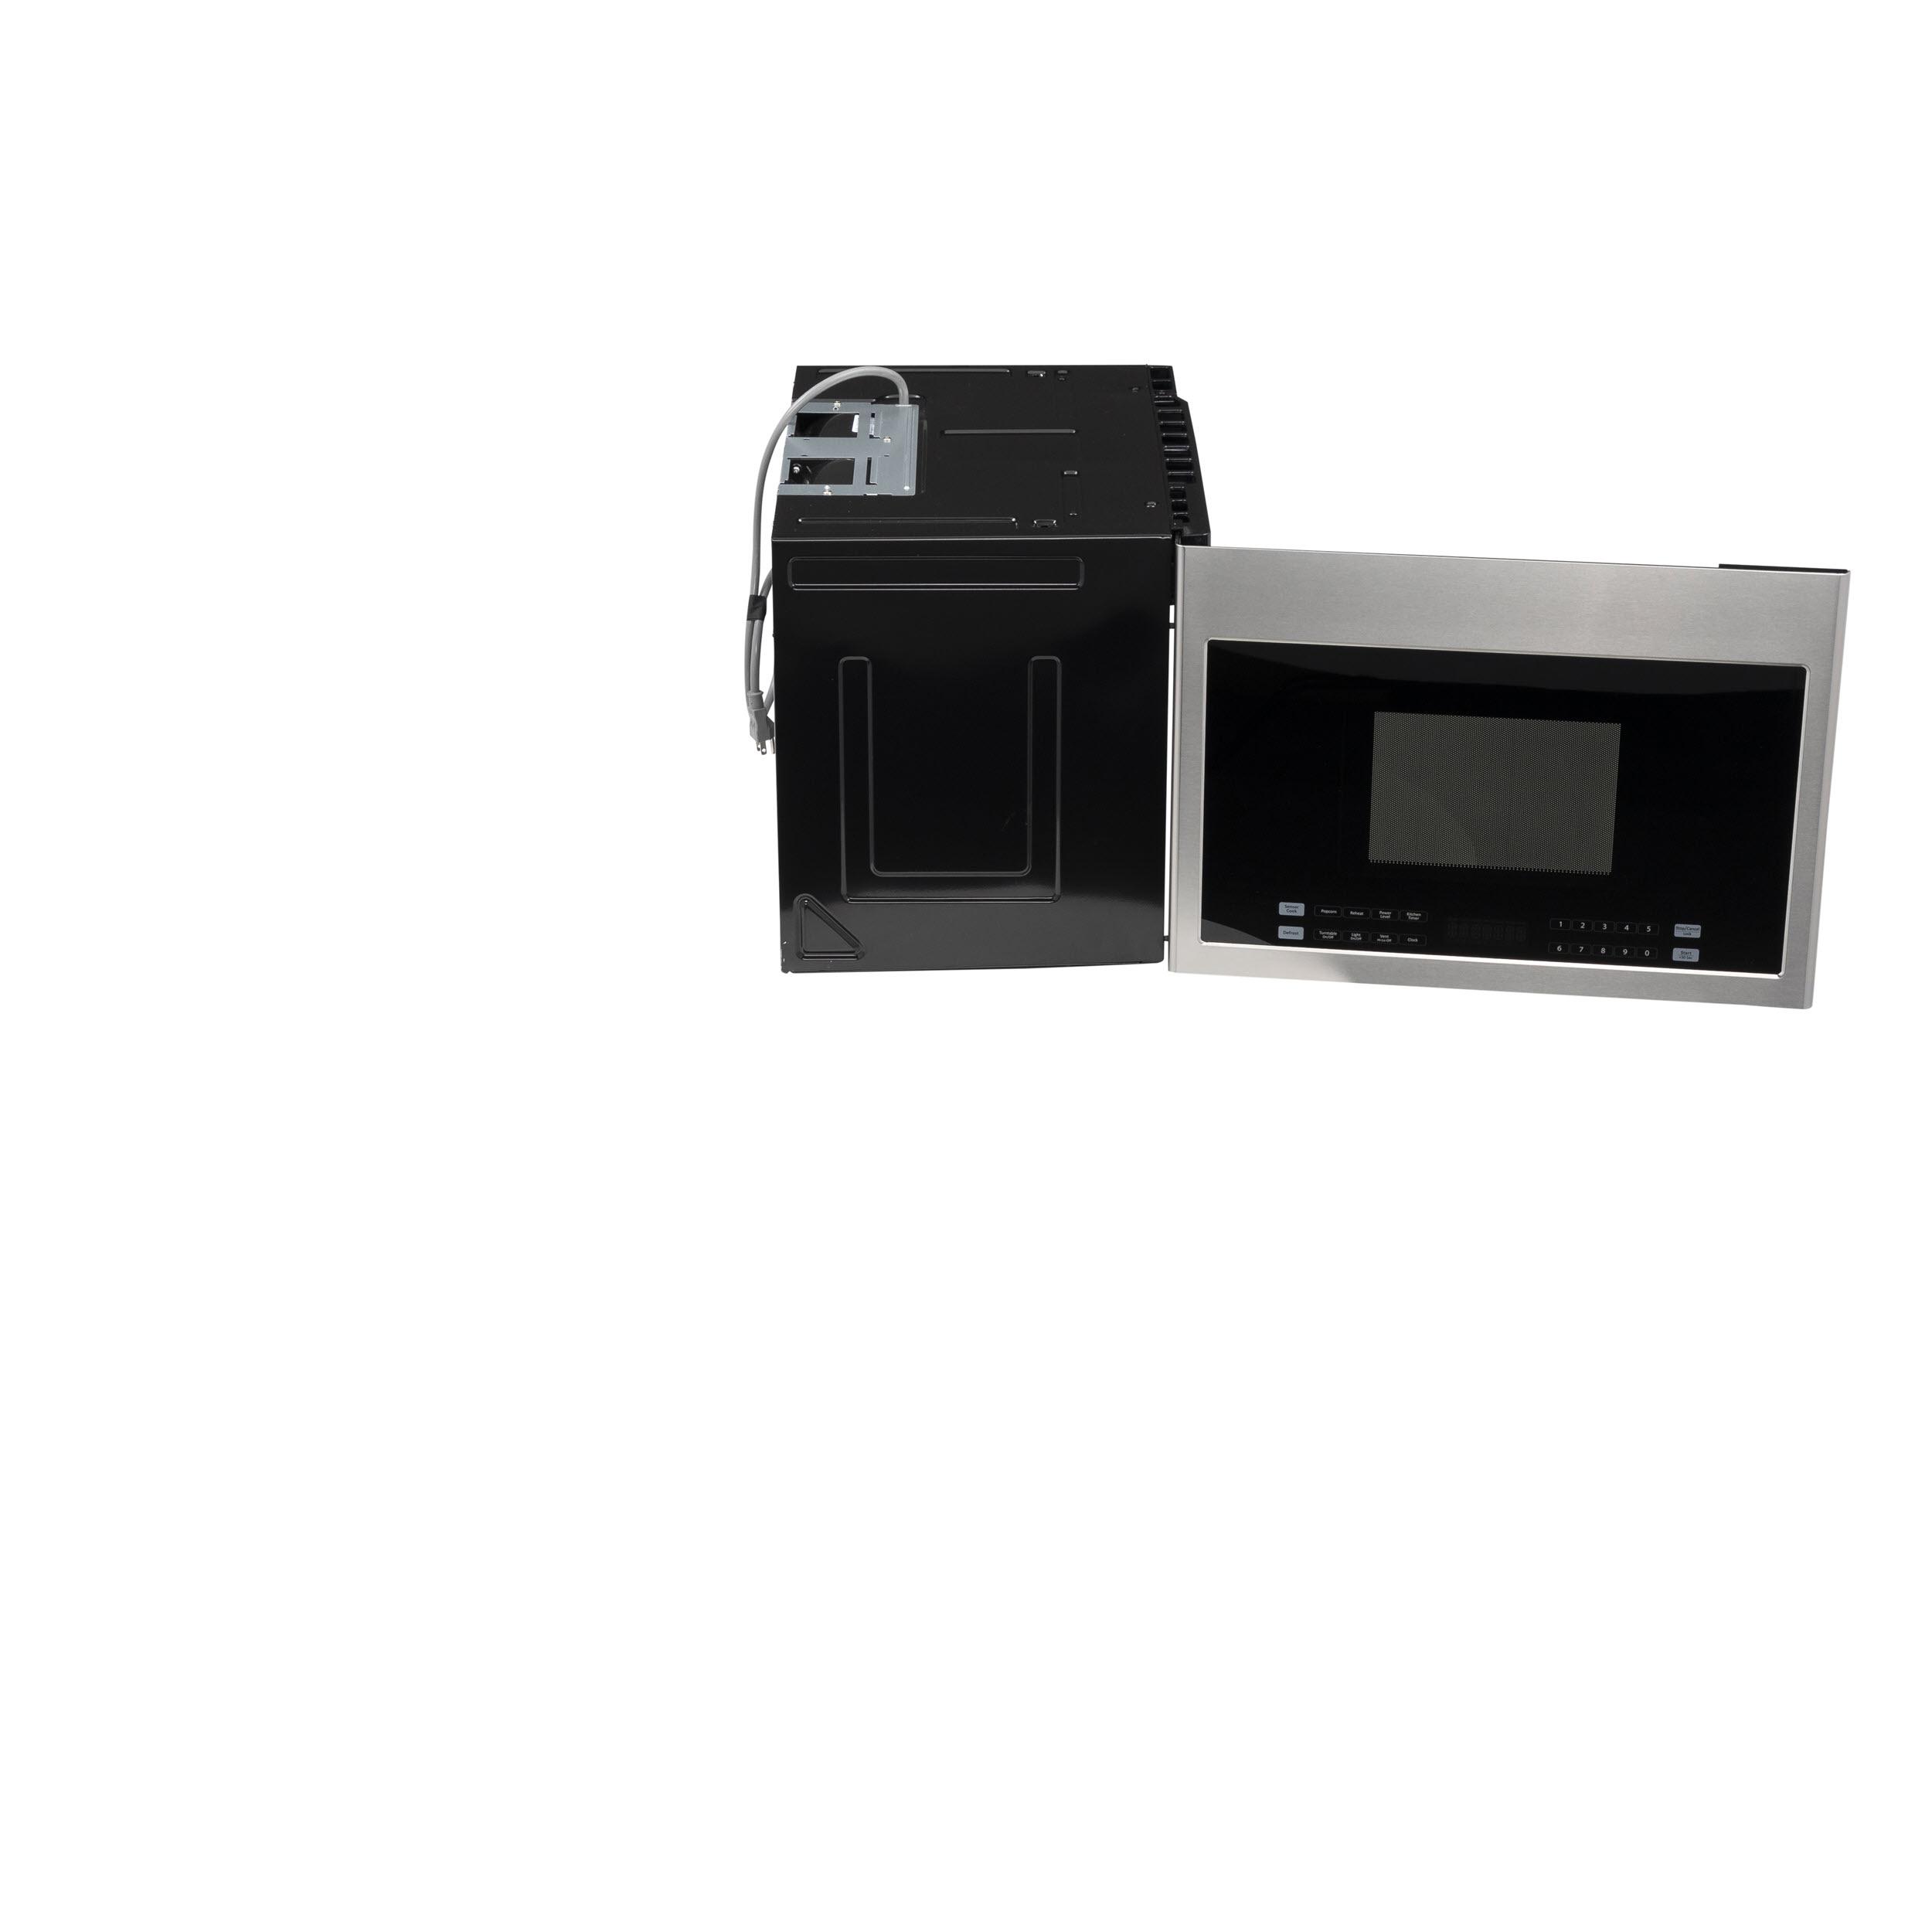 "Model: HMV1472BHS | Haier 24"" 1.4 Cu. Ft. Over-The-Range Microwave Oven"